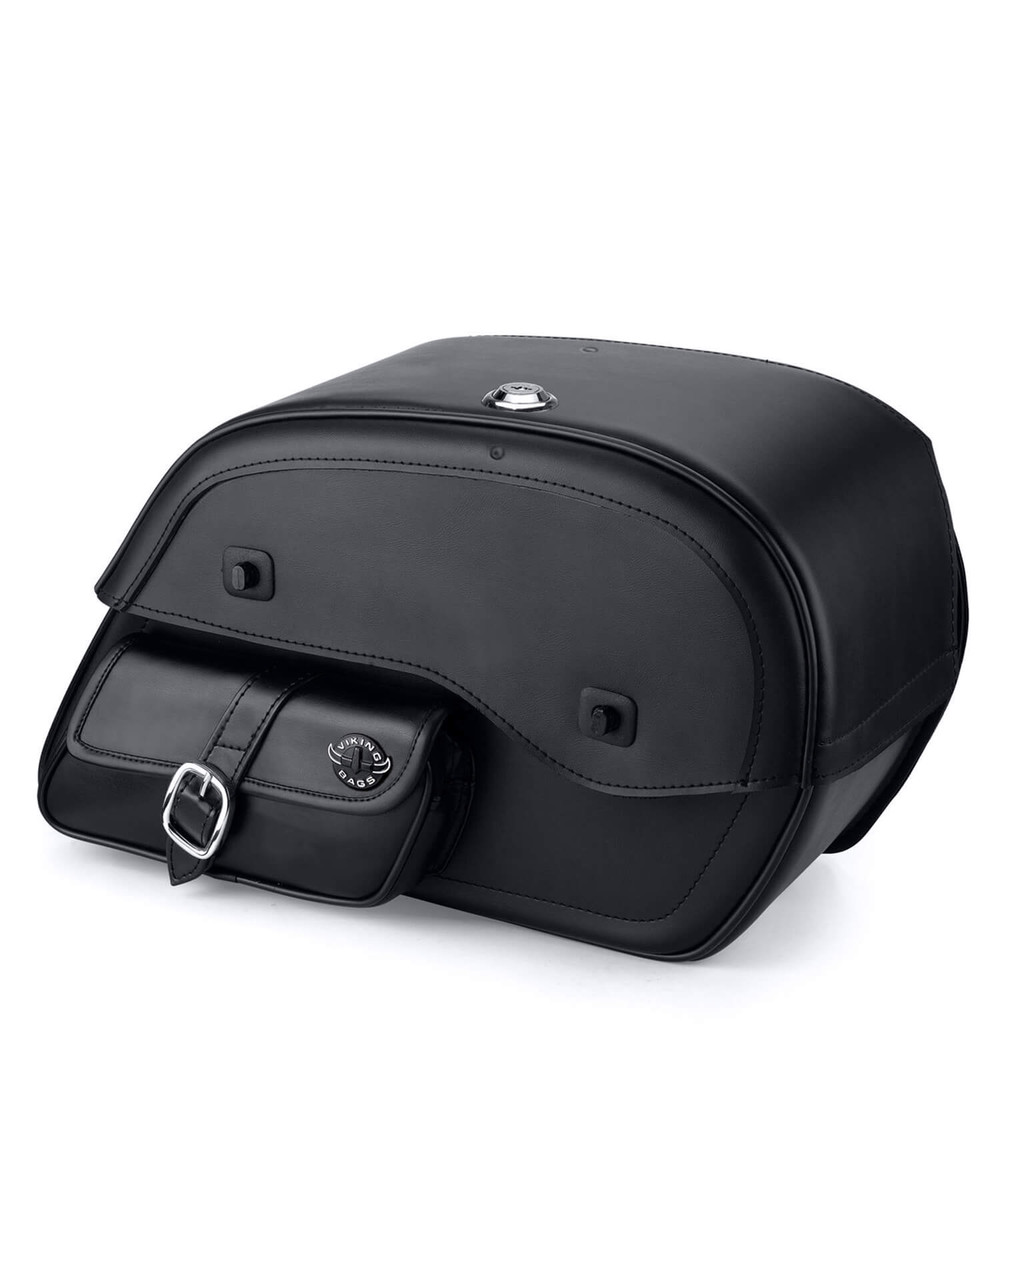 Kawasaki Vulcan 900 Custom Side Pocket Bags Large Motorcycle Saddlebags Main Bag View